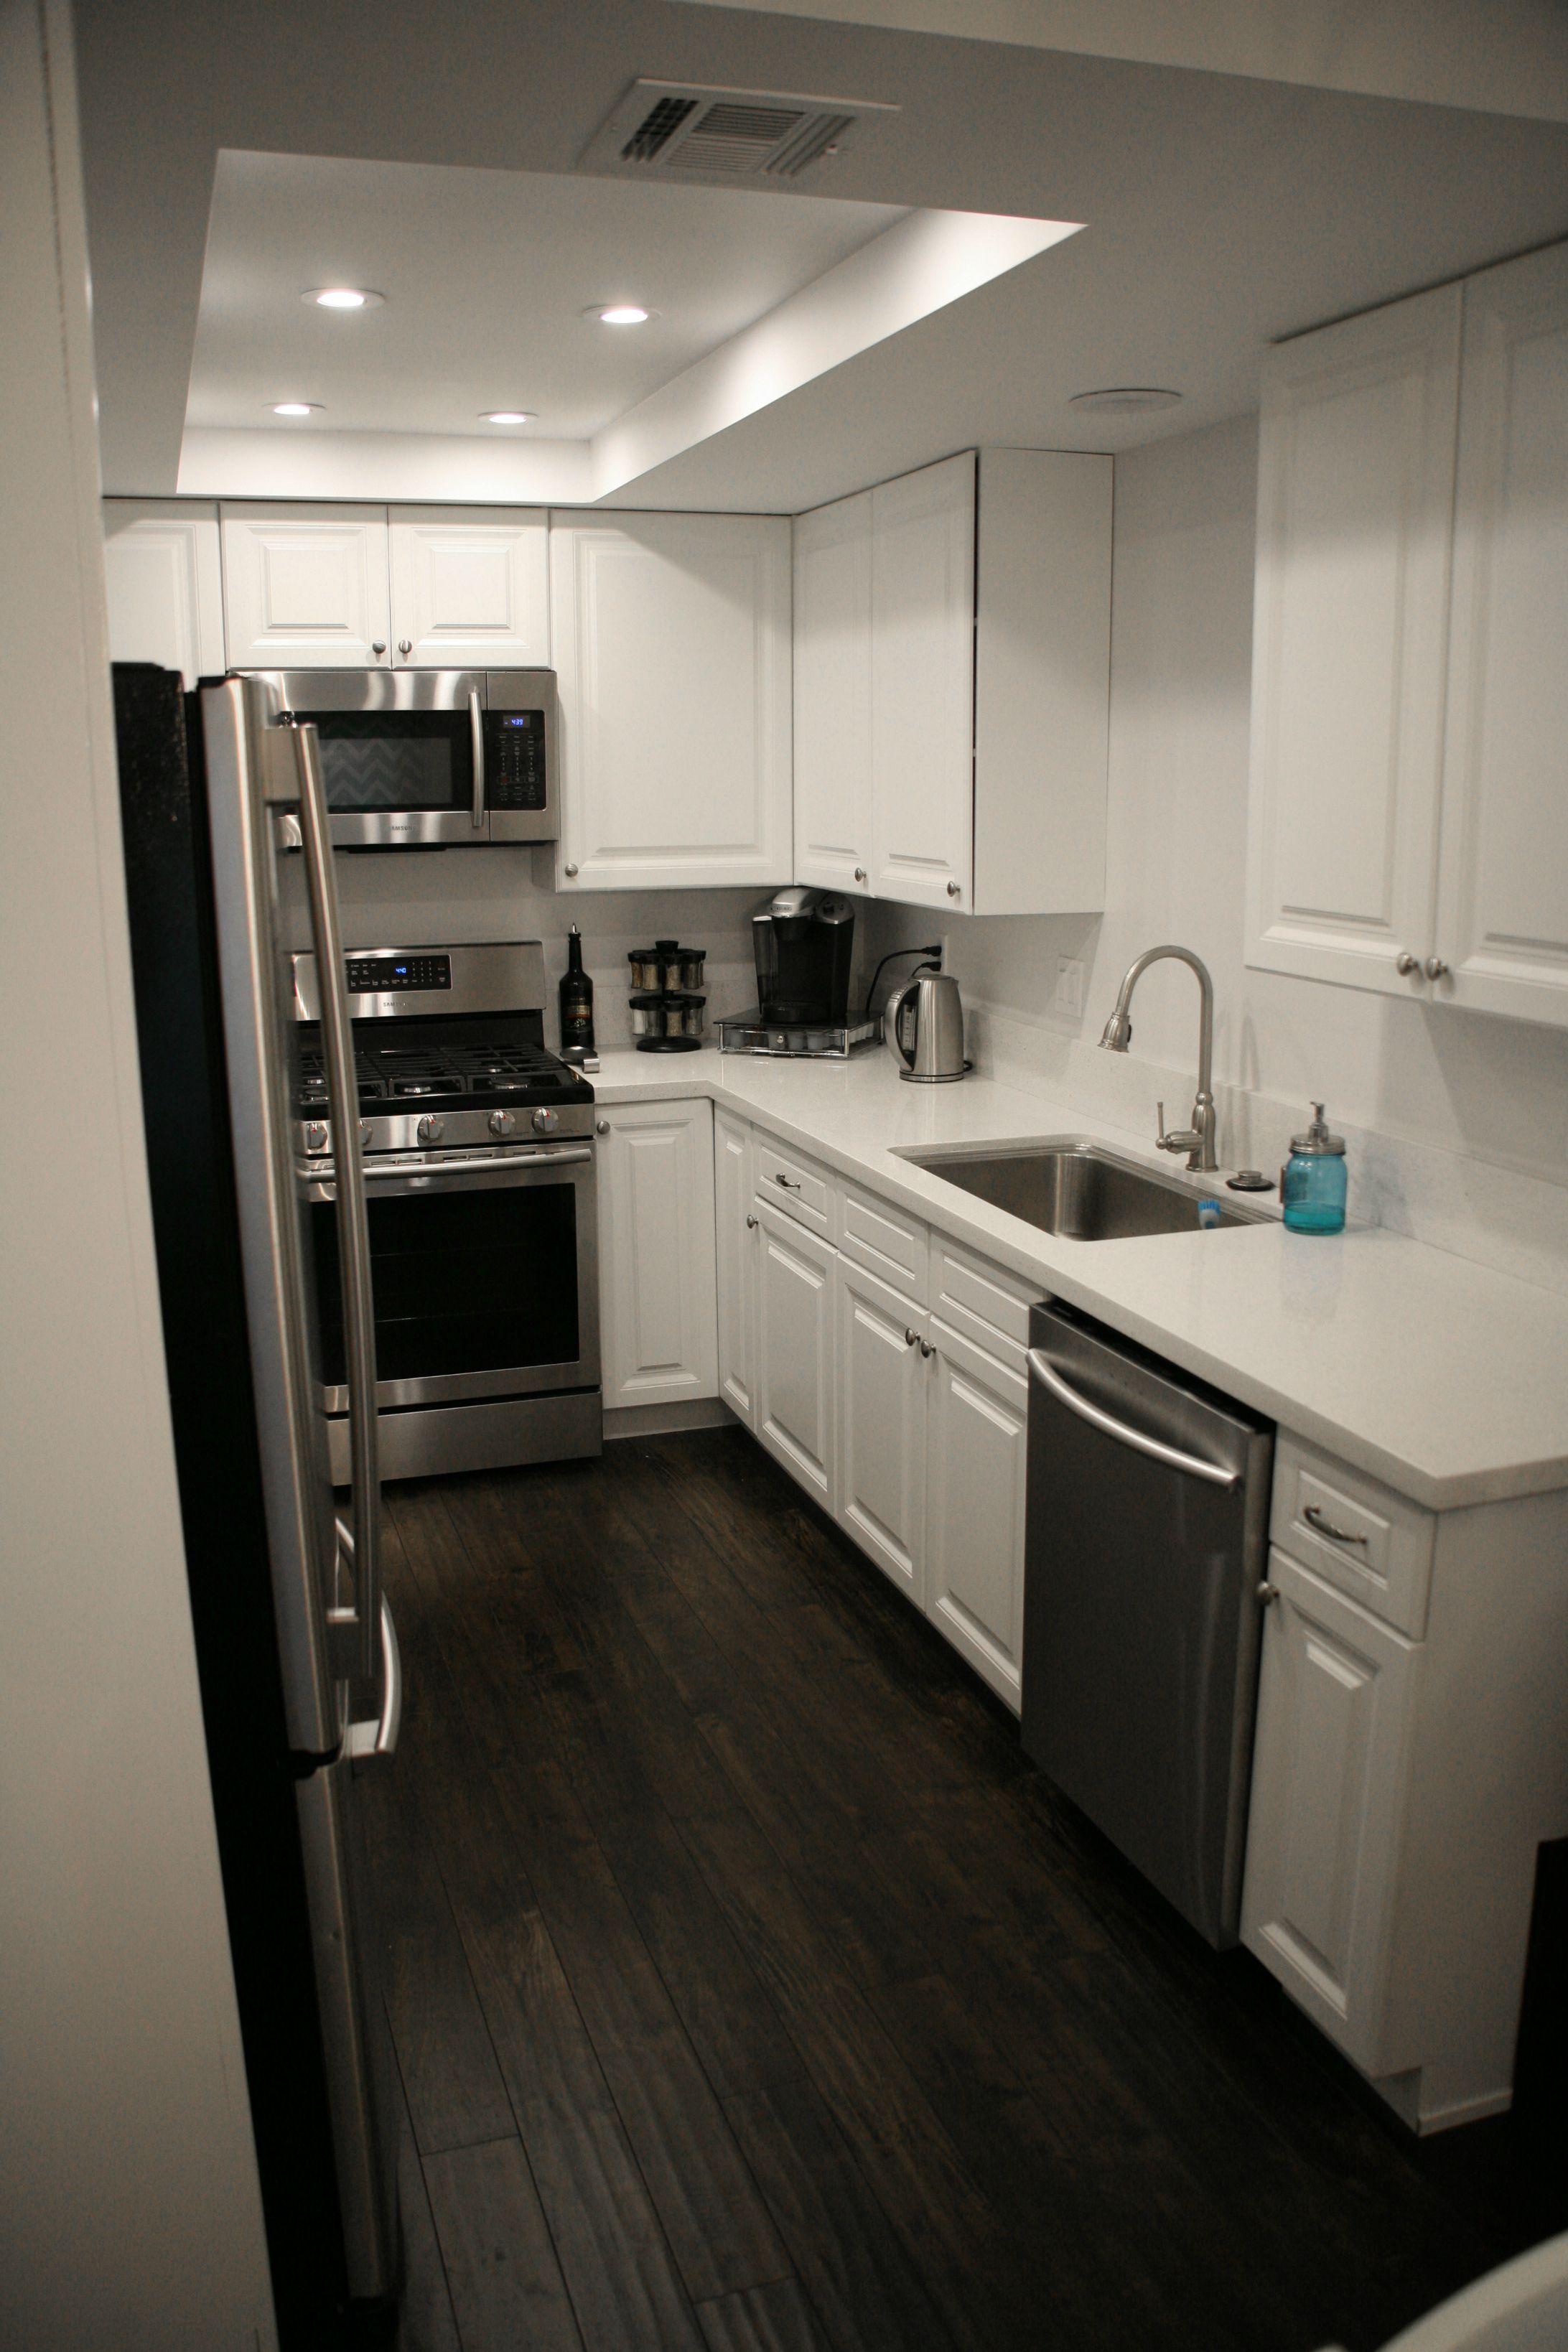 First Home Renovation Home Renovation Grey Countertops White Quartz Countertop